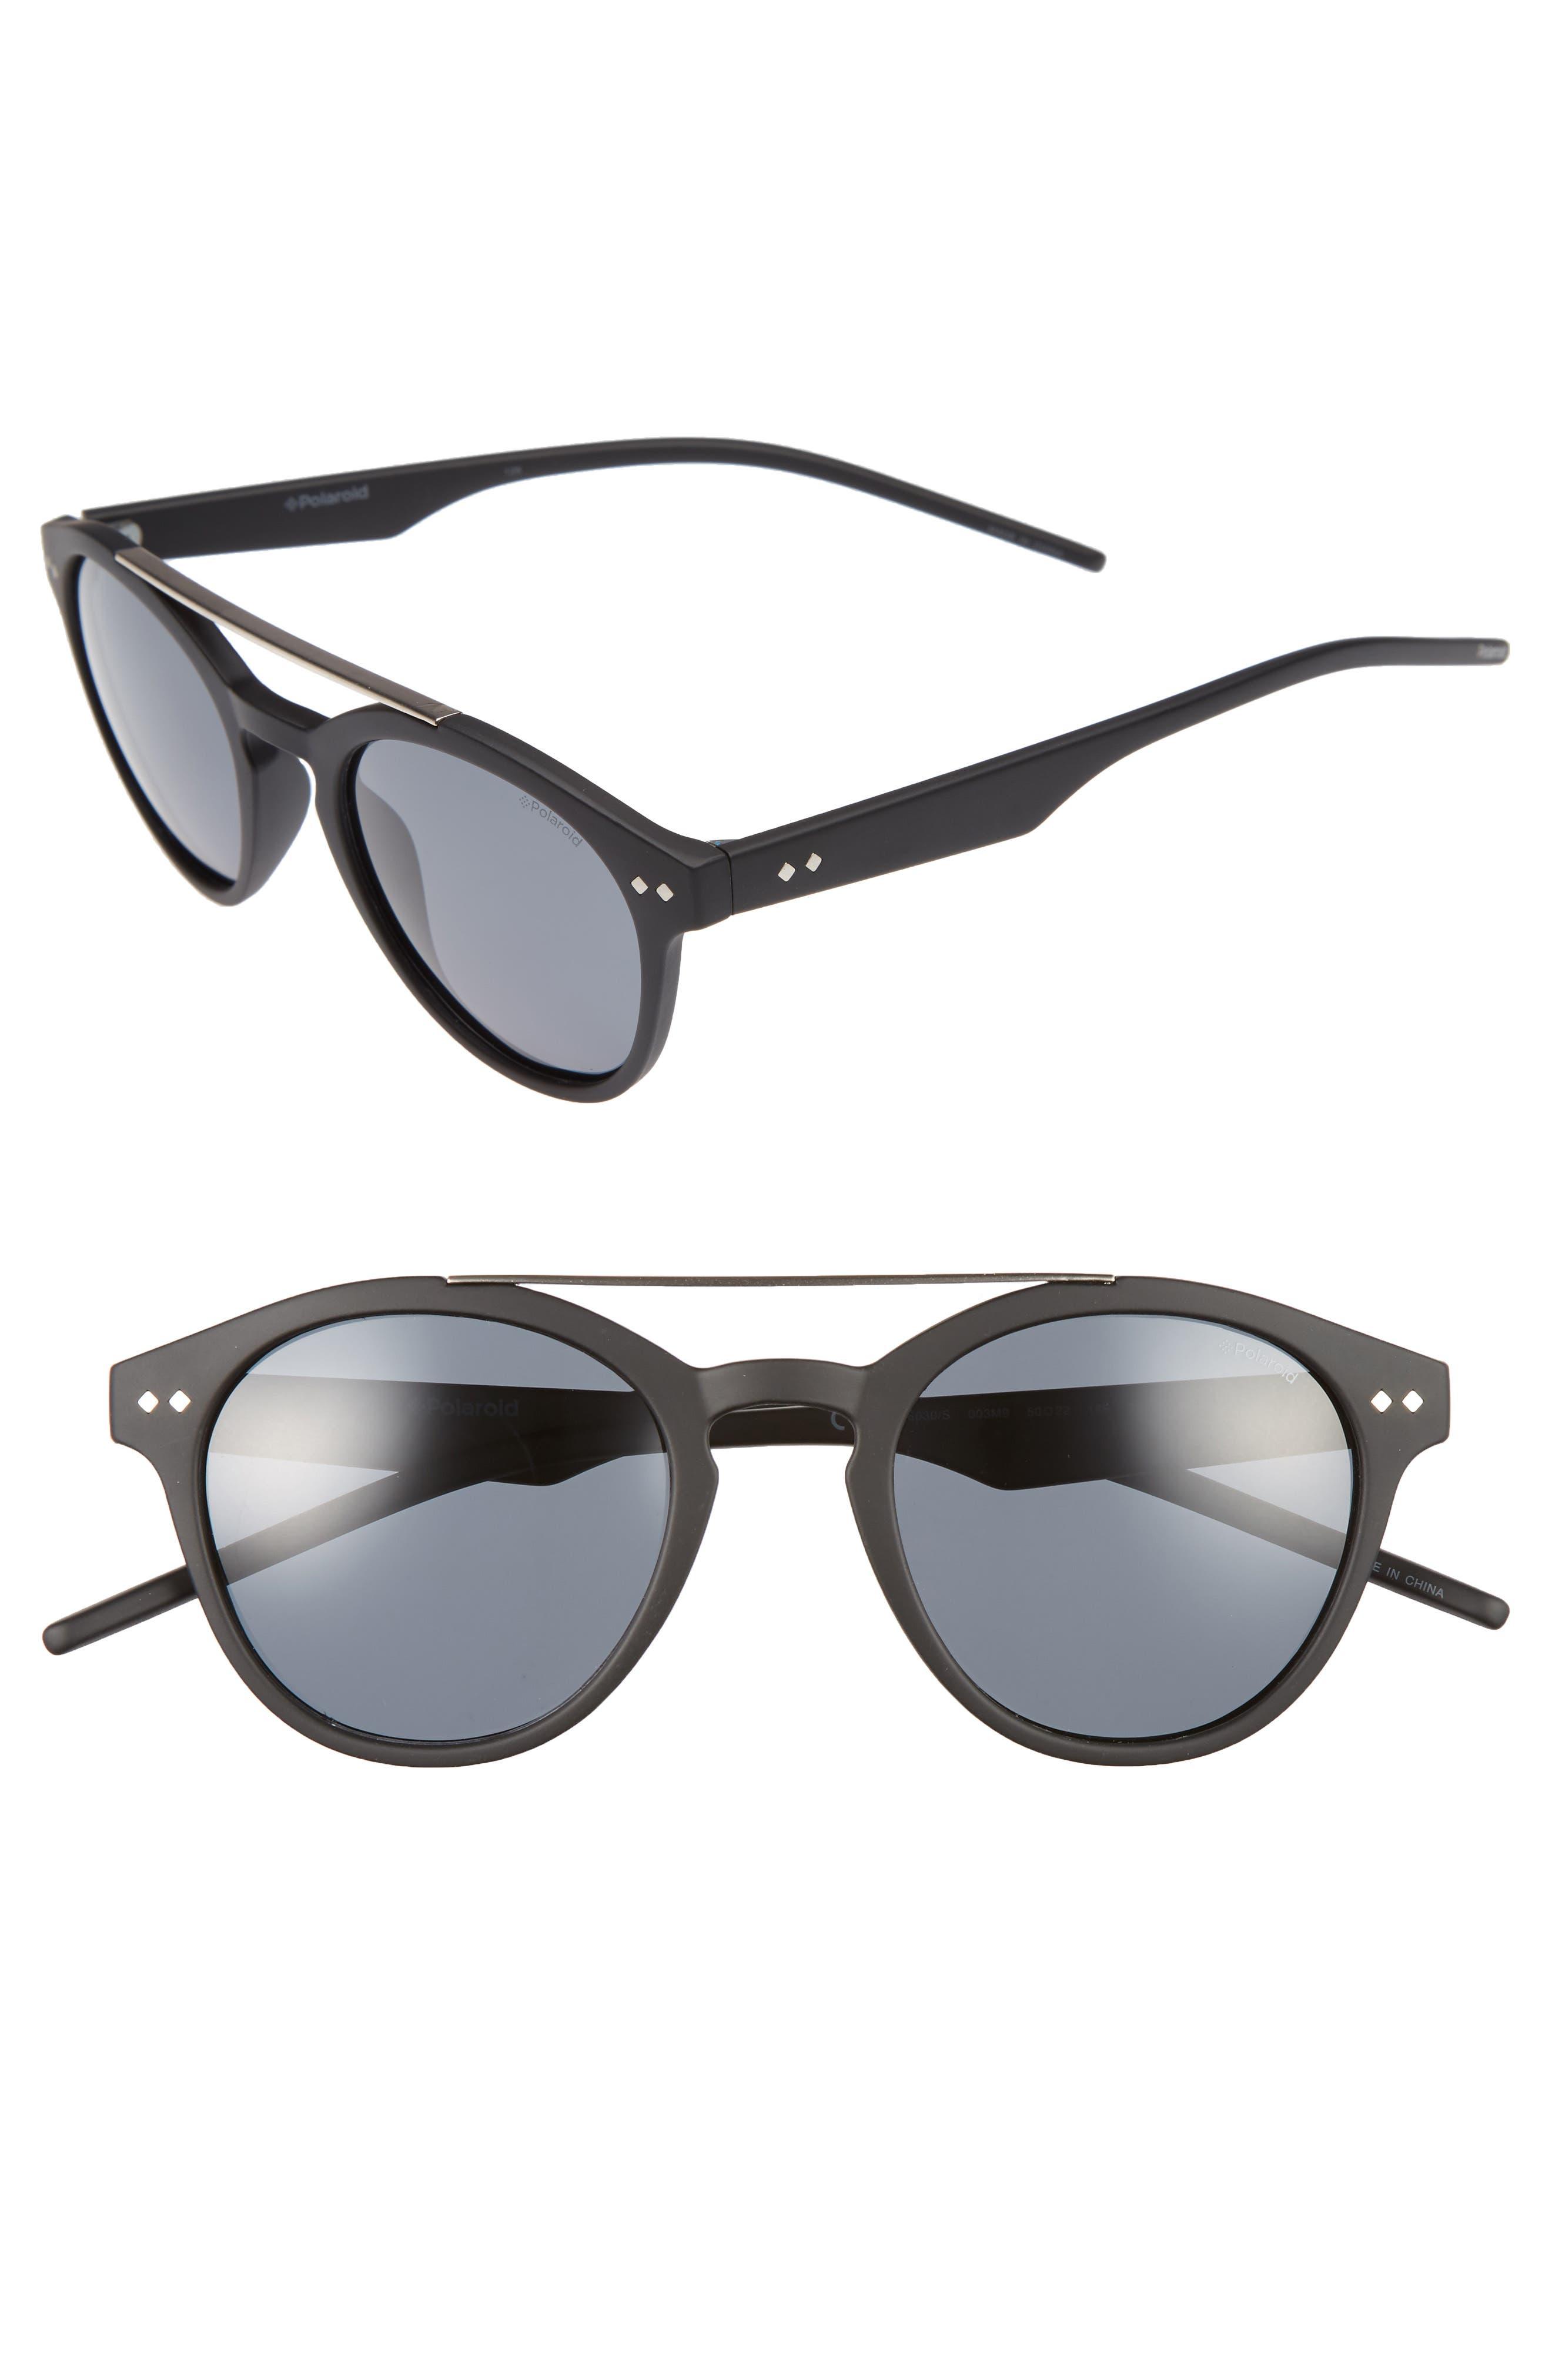 Main Image - Polaroid 50mm Polarized Retro Sunglasses